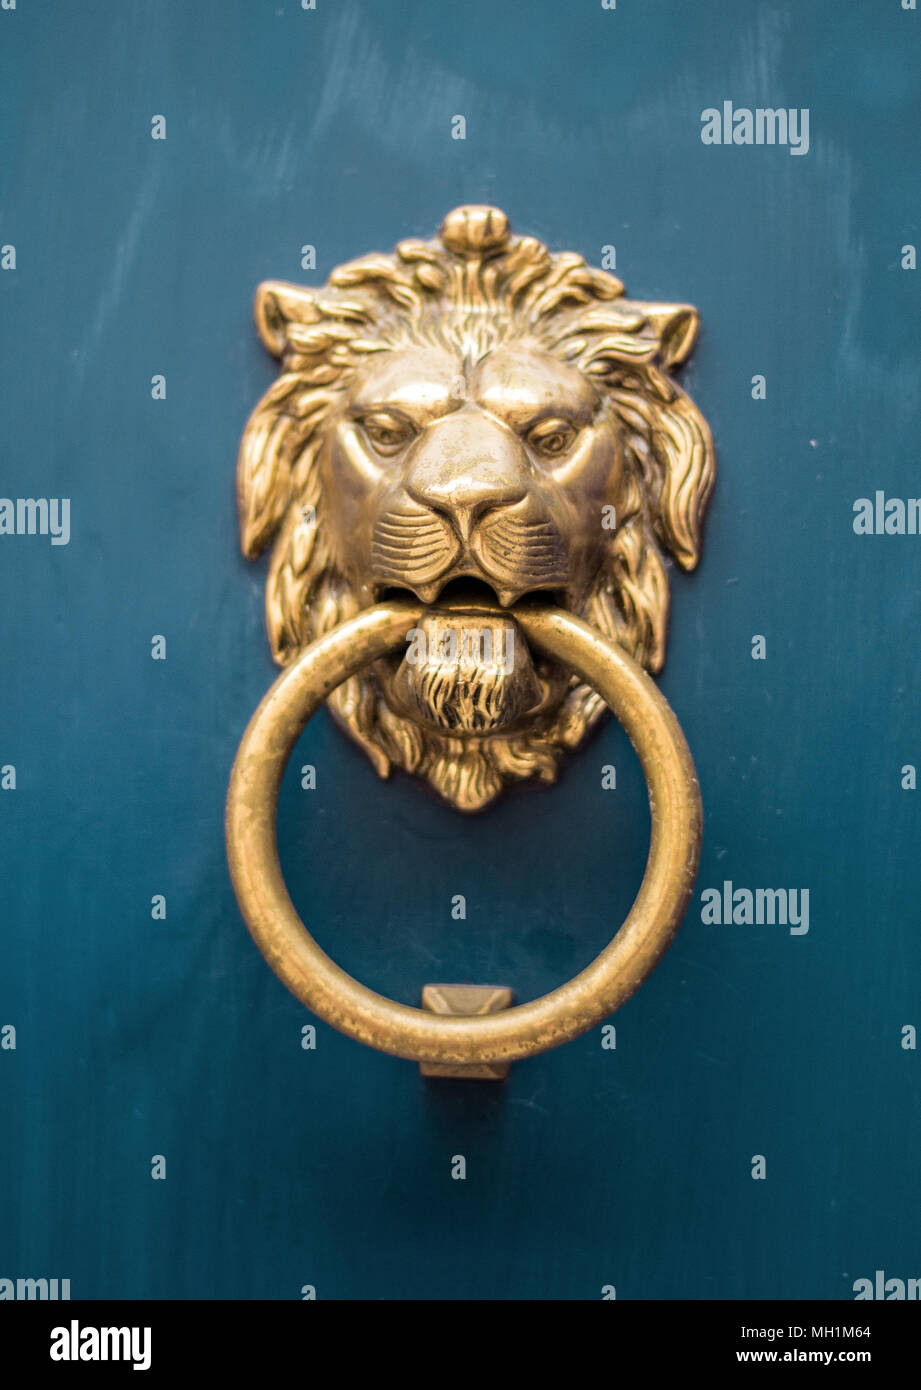 antique door knob lion head - Stock Image